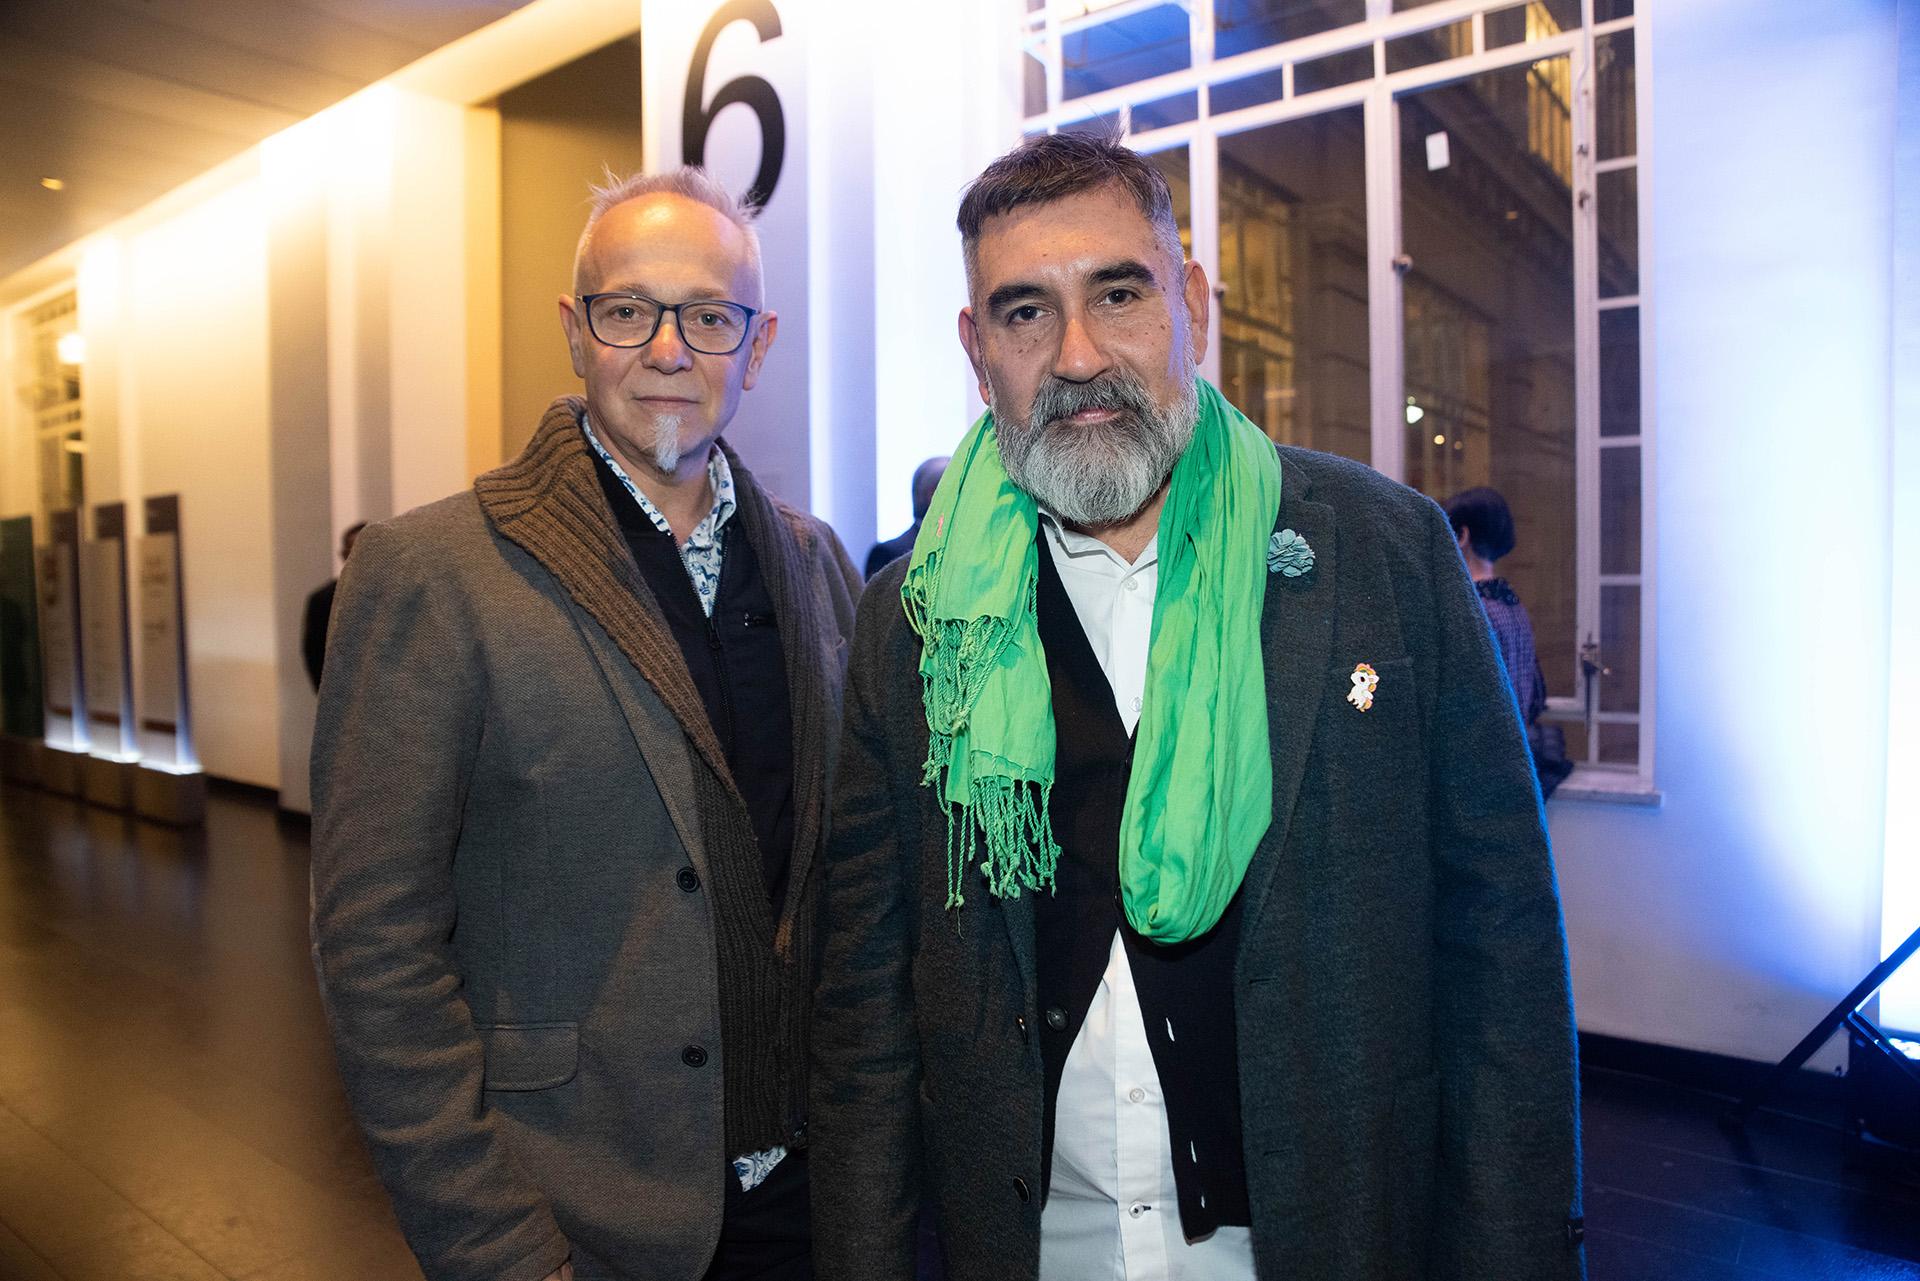 Los artistas Chiachio & Giannone